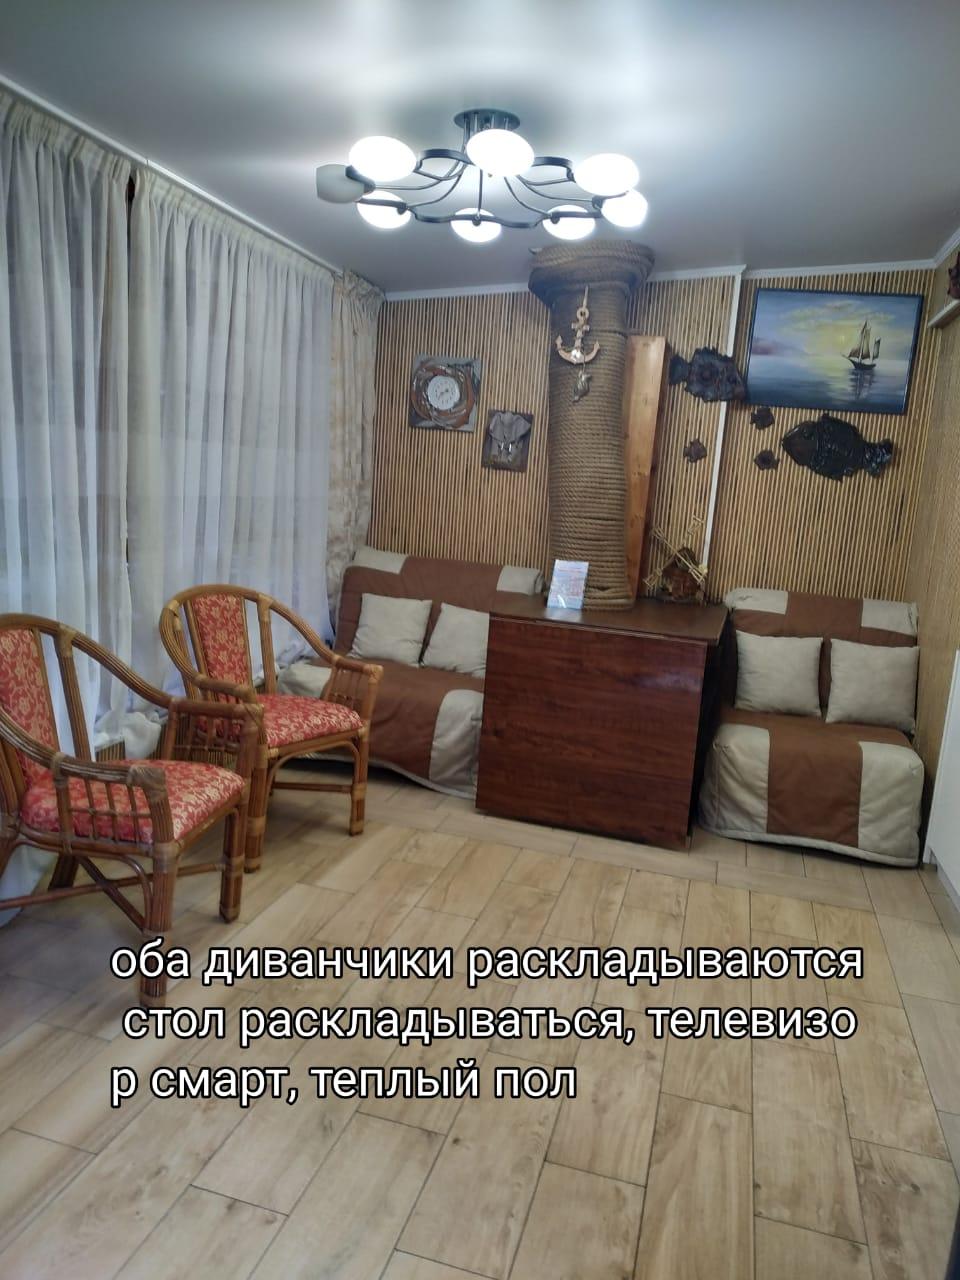 https://yaltaroom.ru/wp-content/uploads/2021/02/WhatsApp-Image-2021-02-22-at-13.59.17-2.jpeg